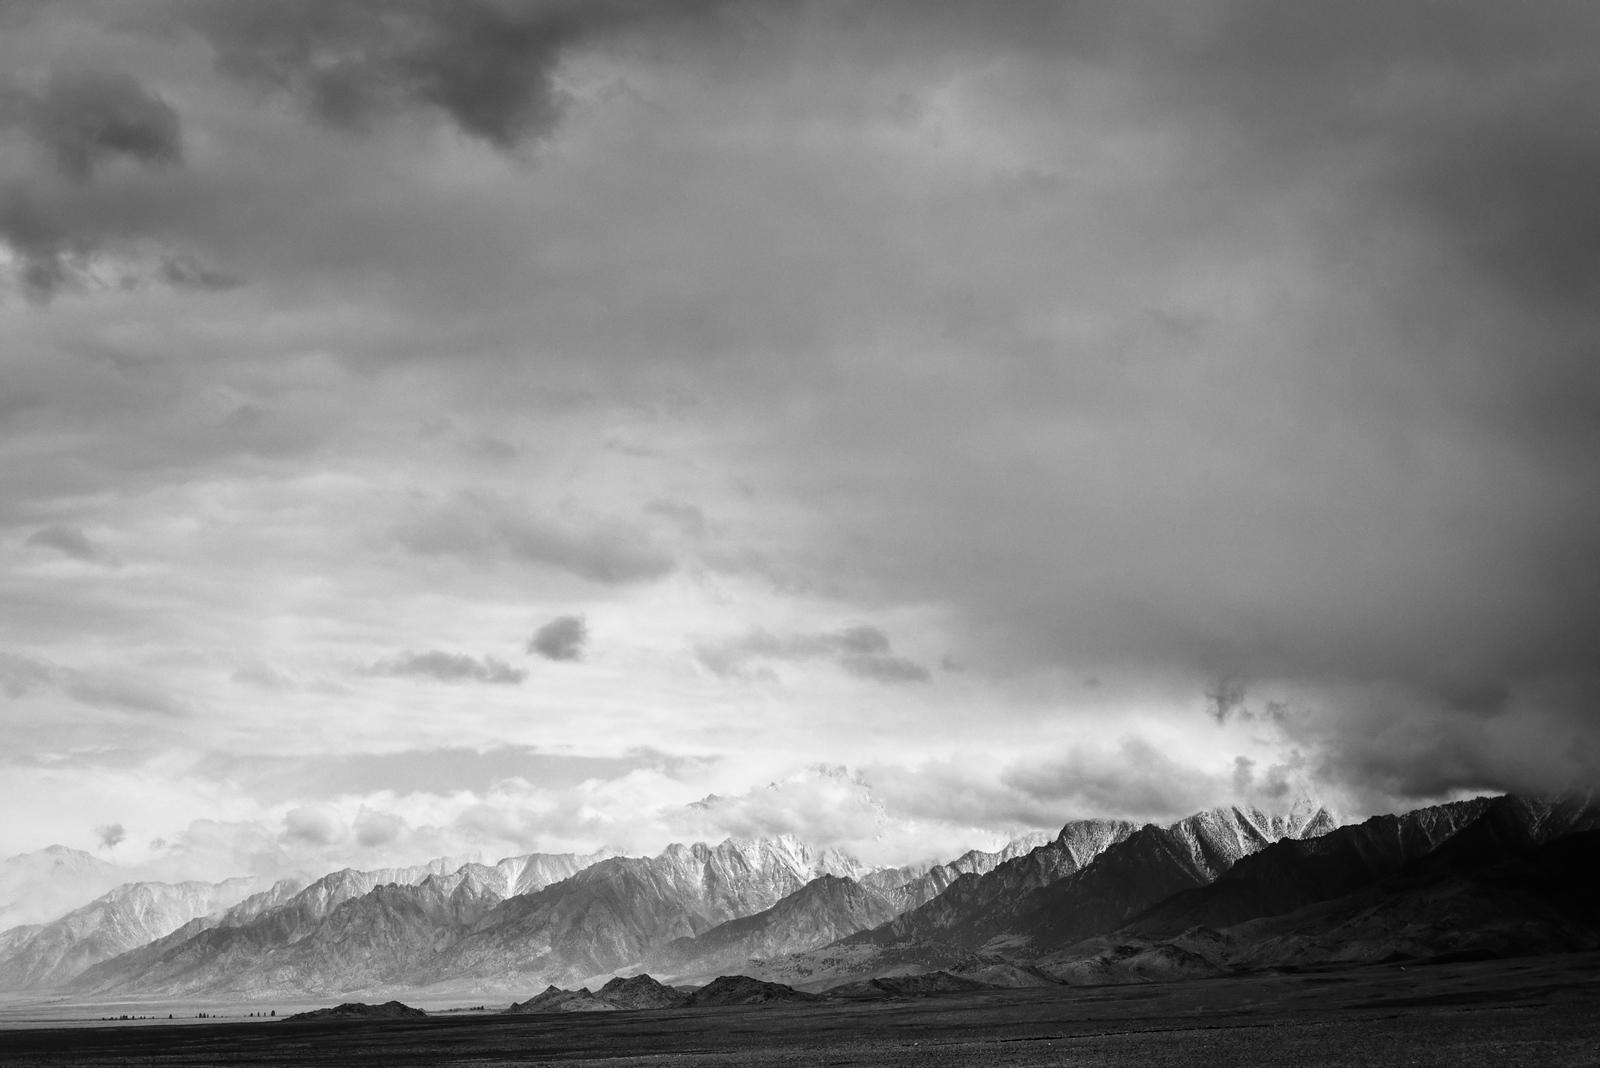 Storm clouds along the Sierra Crest